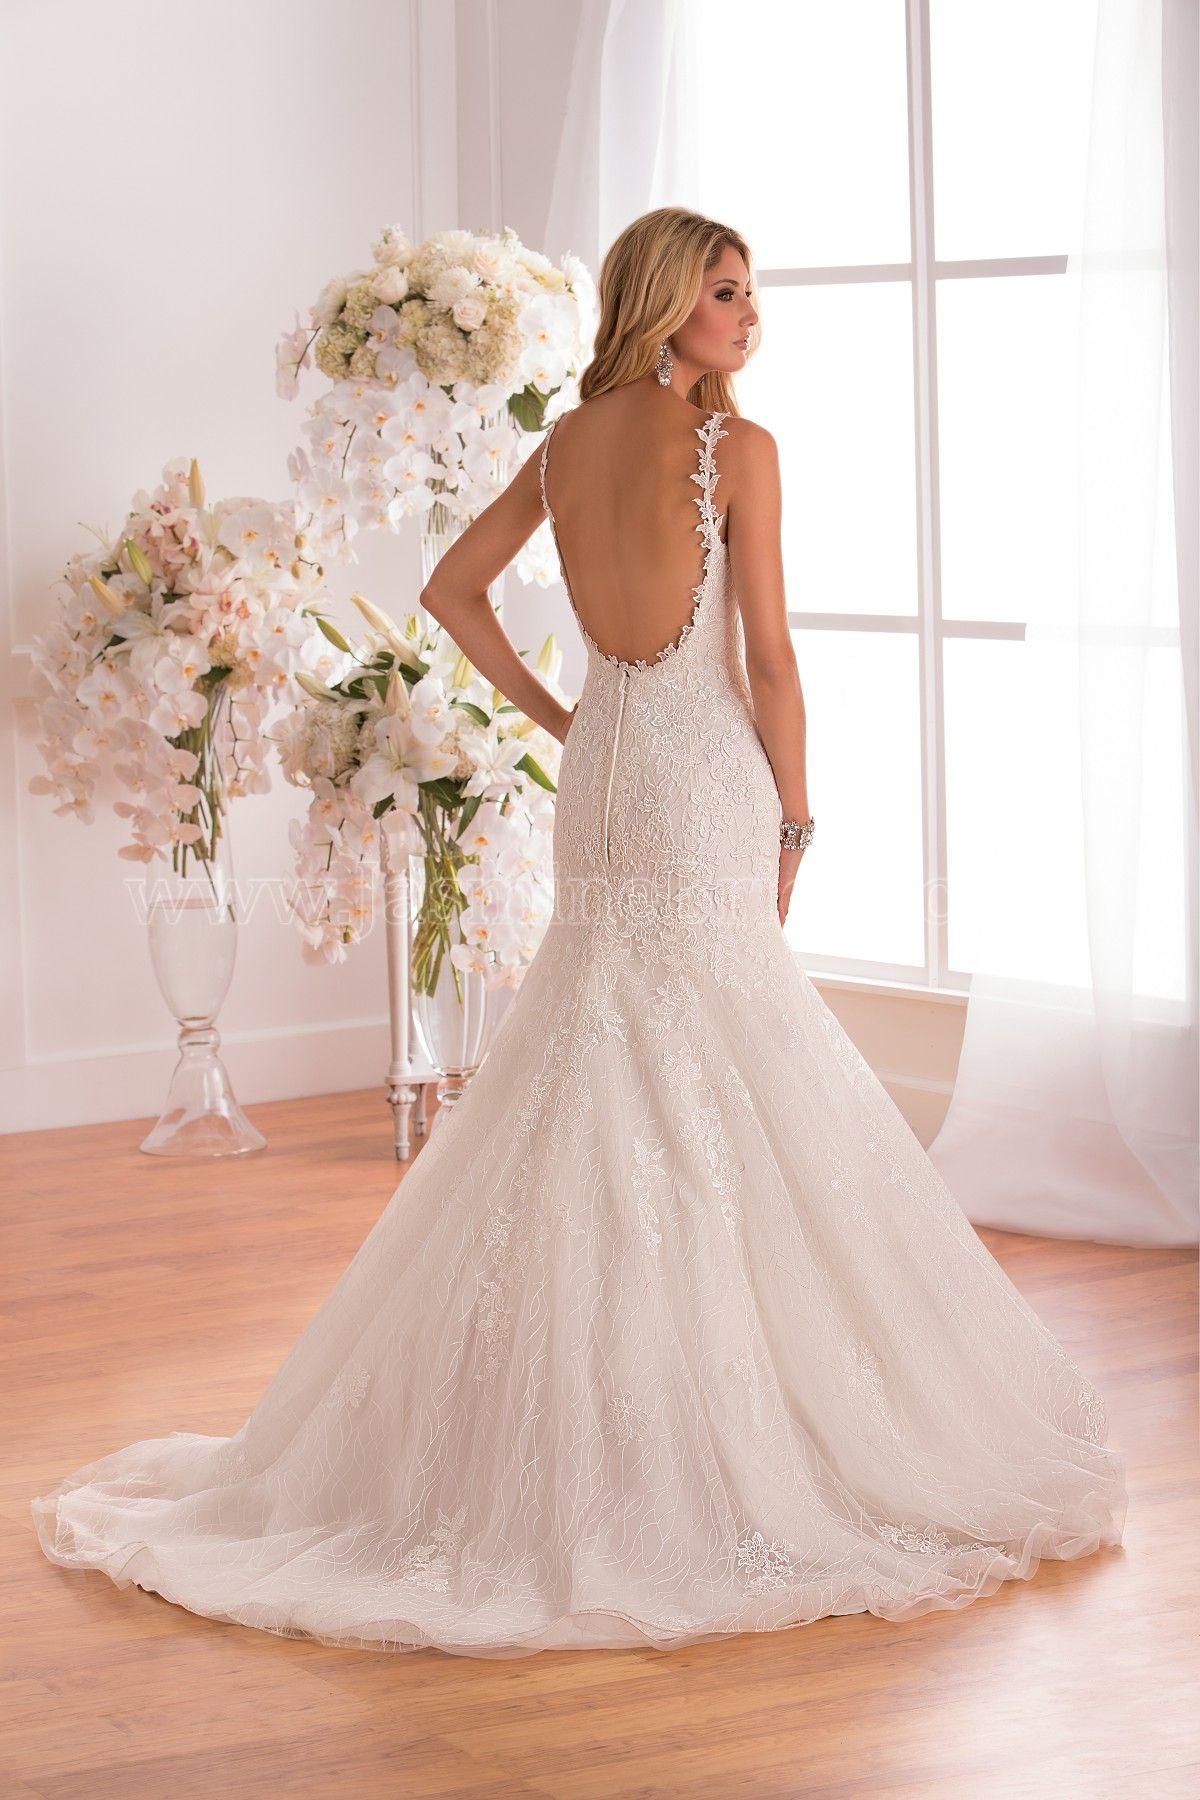 Style f wedding dresses jasmine spring collection